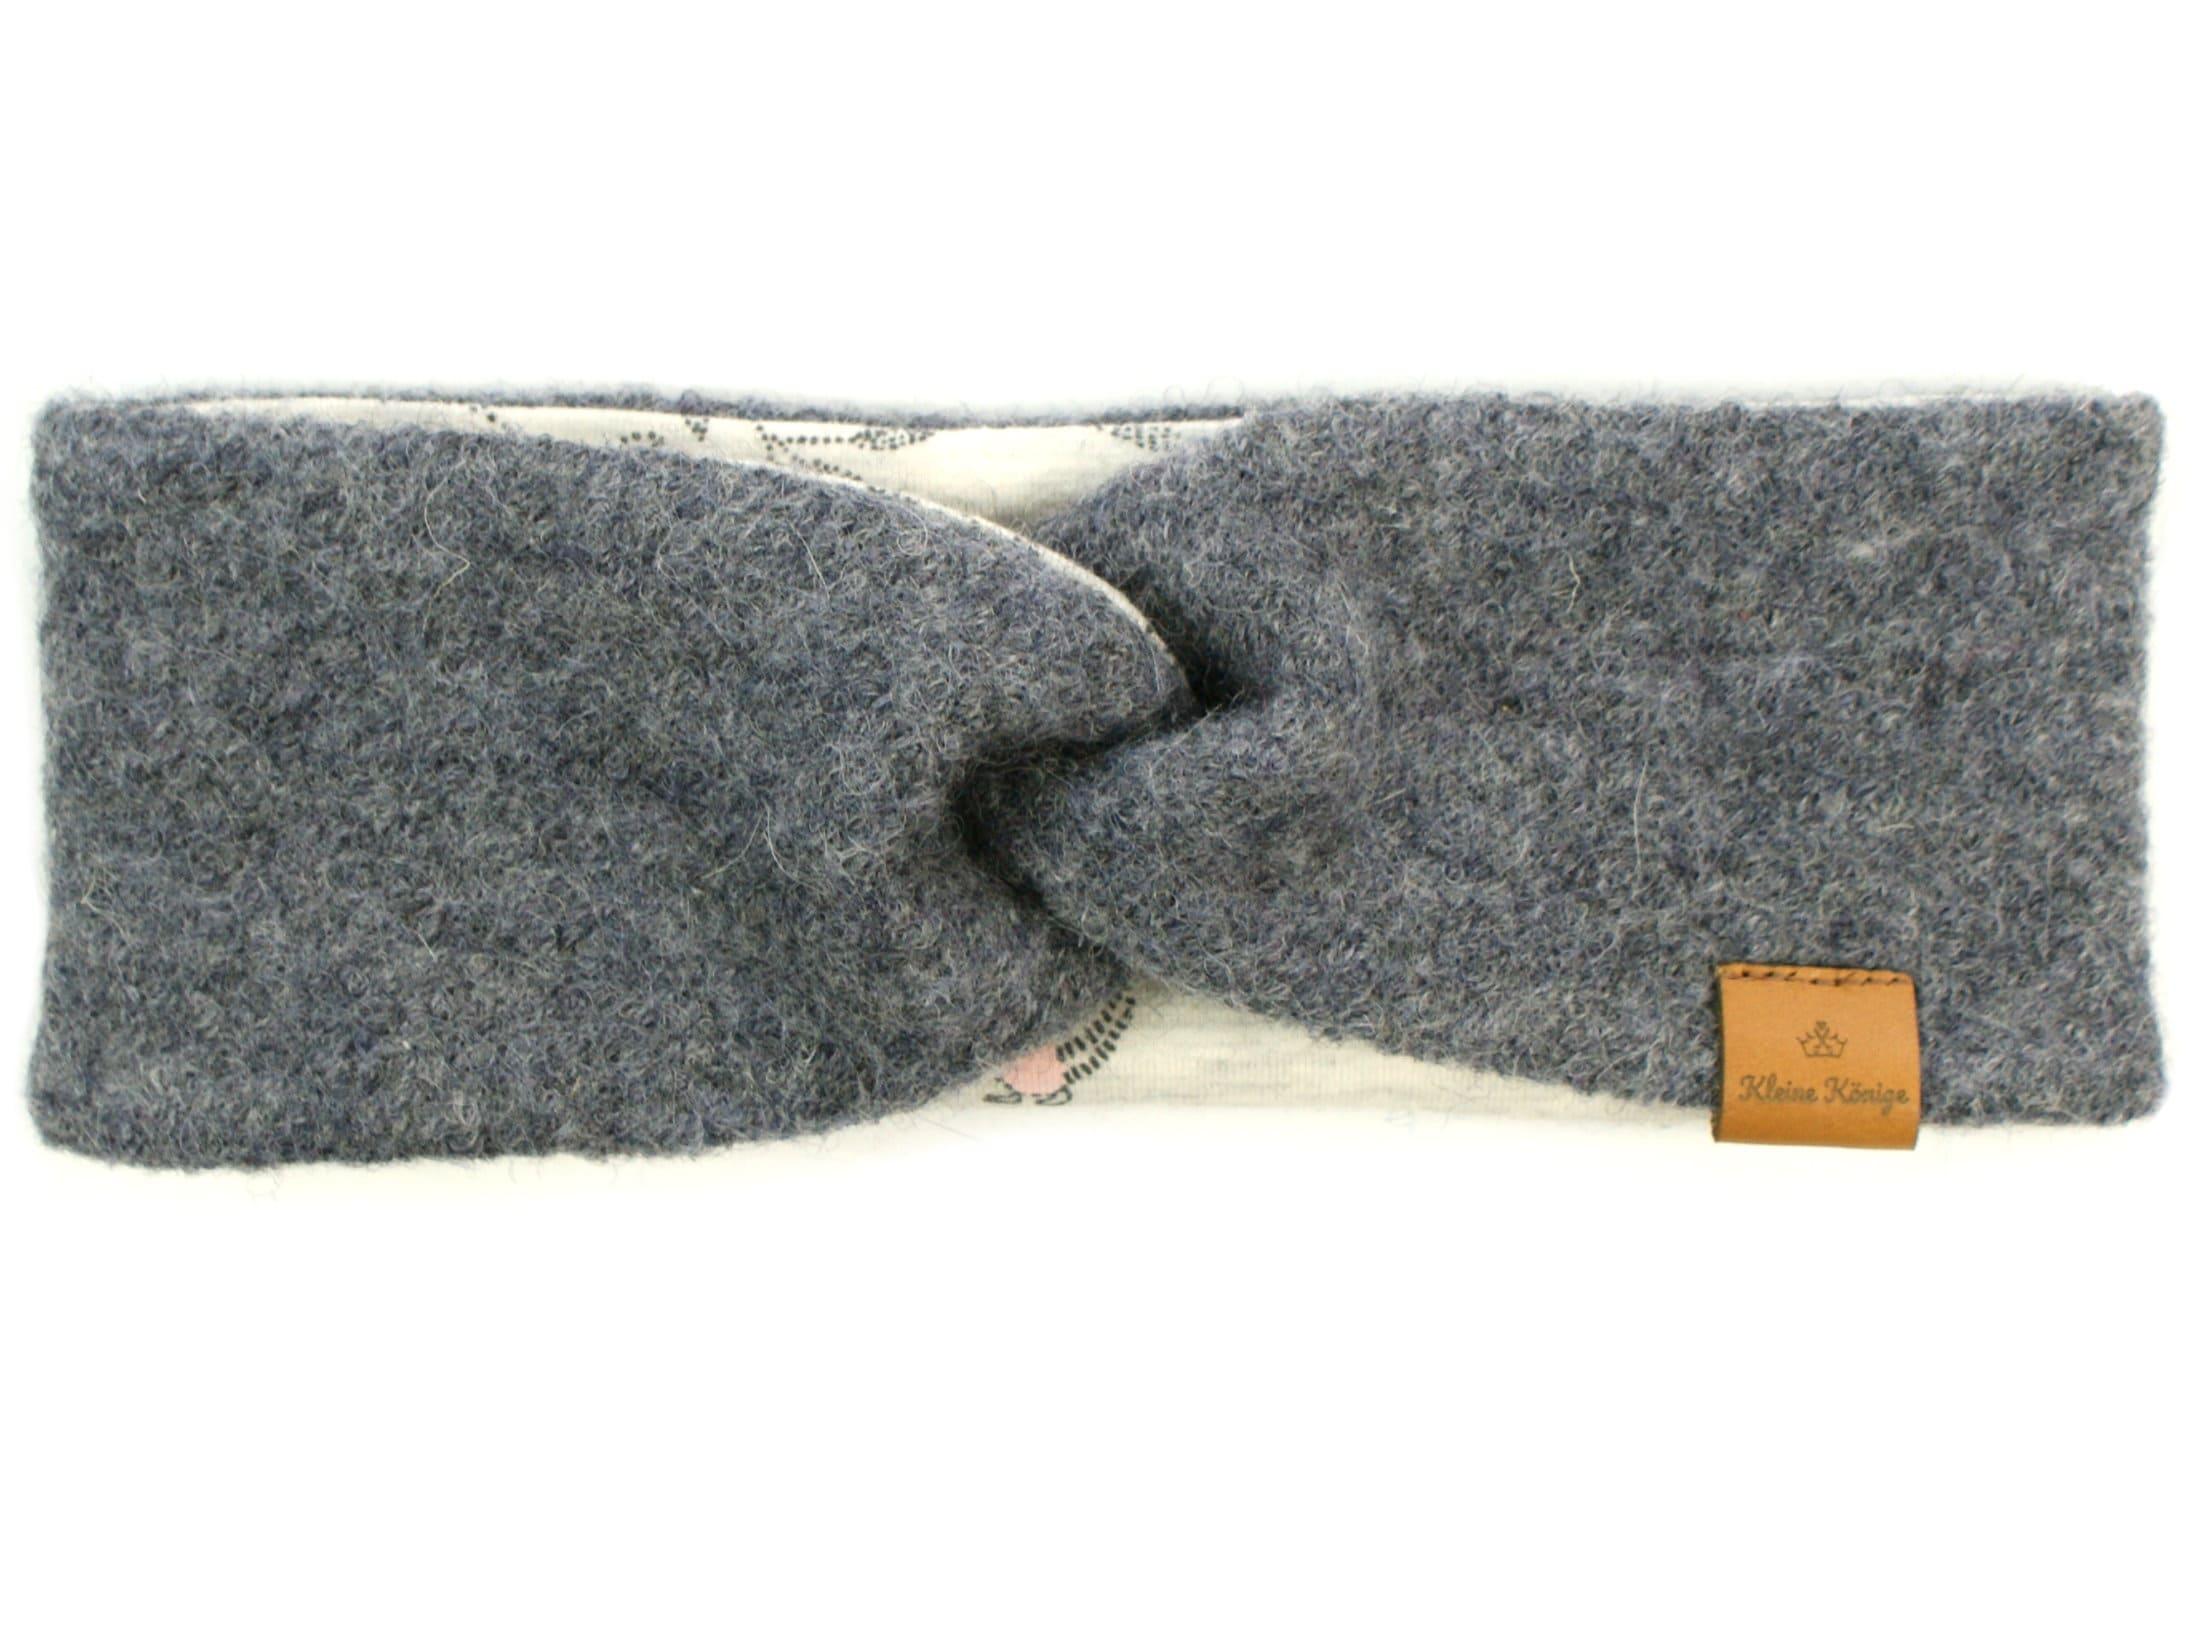 Walk Kinder Stirnband Haarband aus Wollwalk in Grau